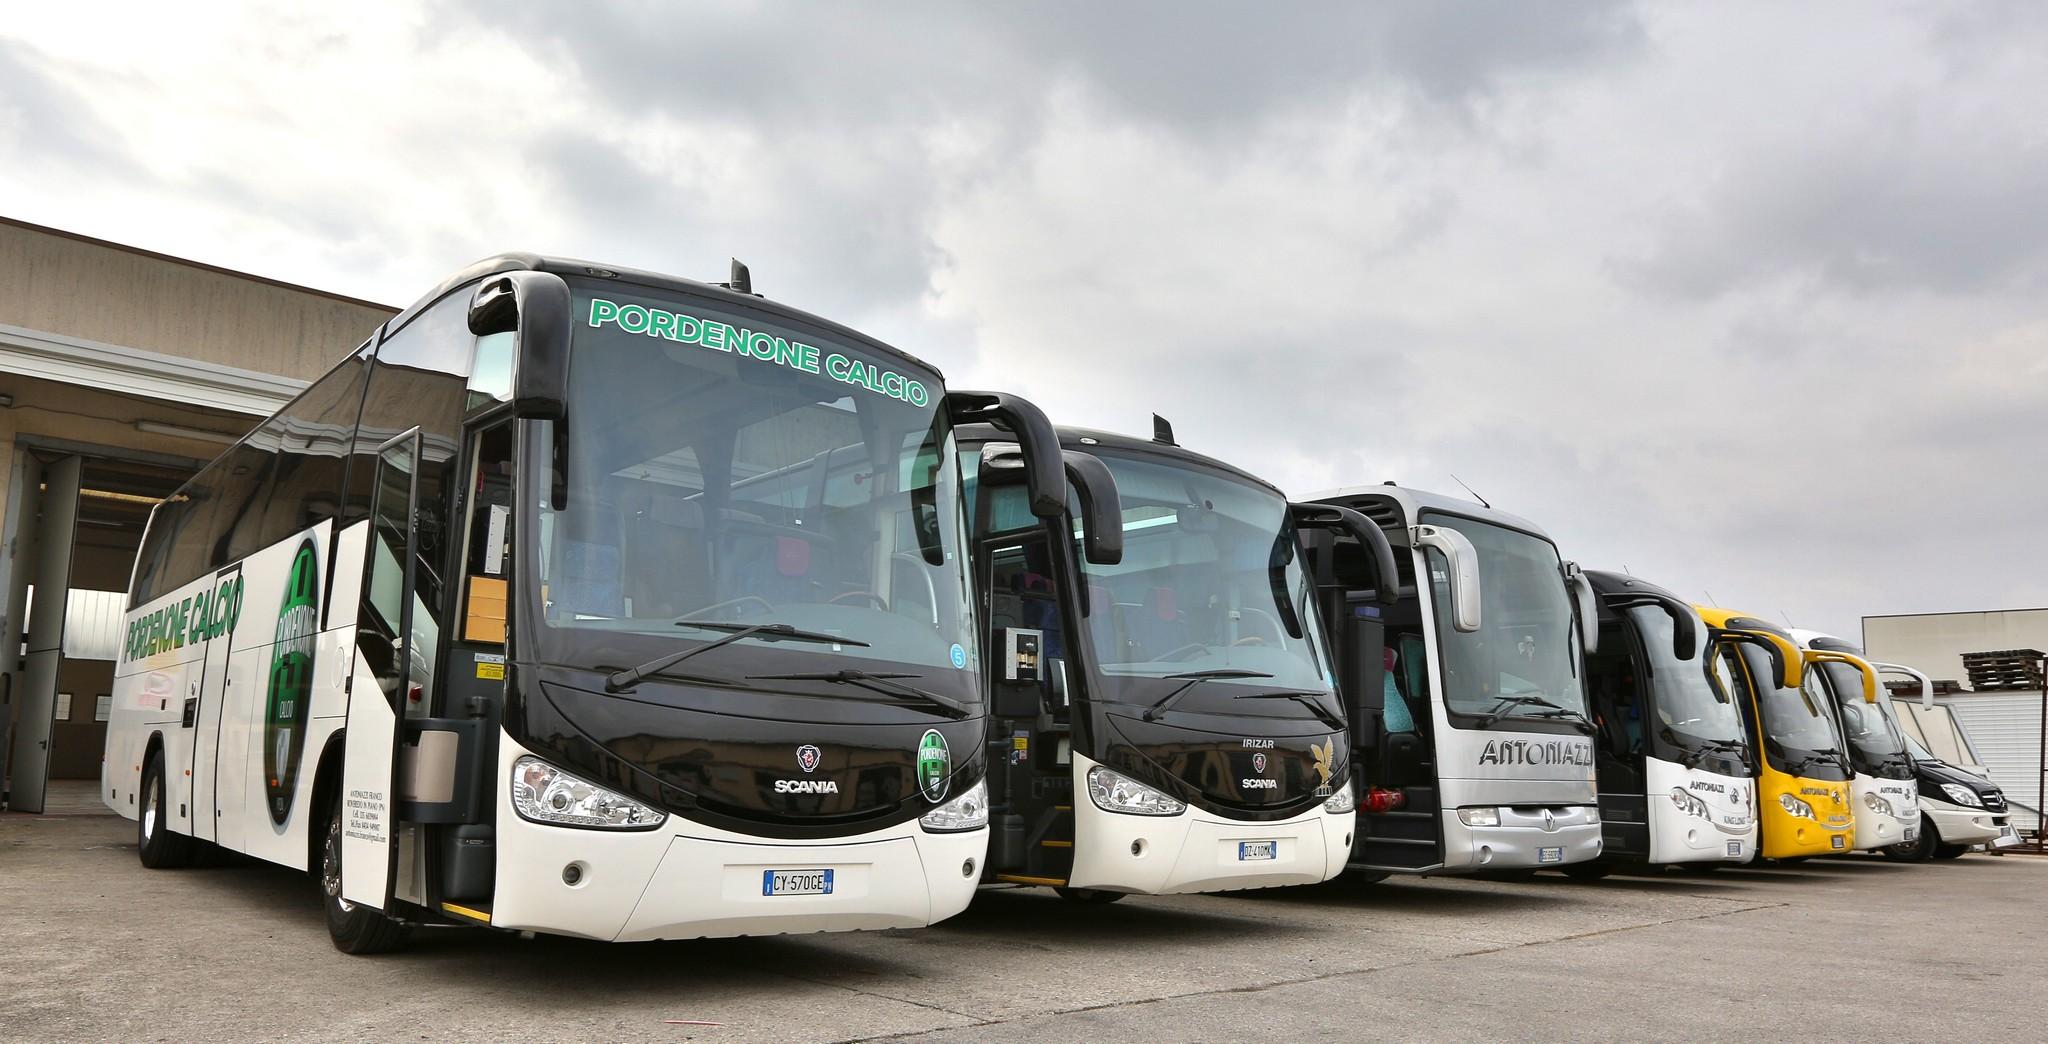 Antoniazzi Atuobus Pordenone Parco Autobus